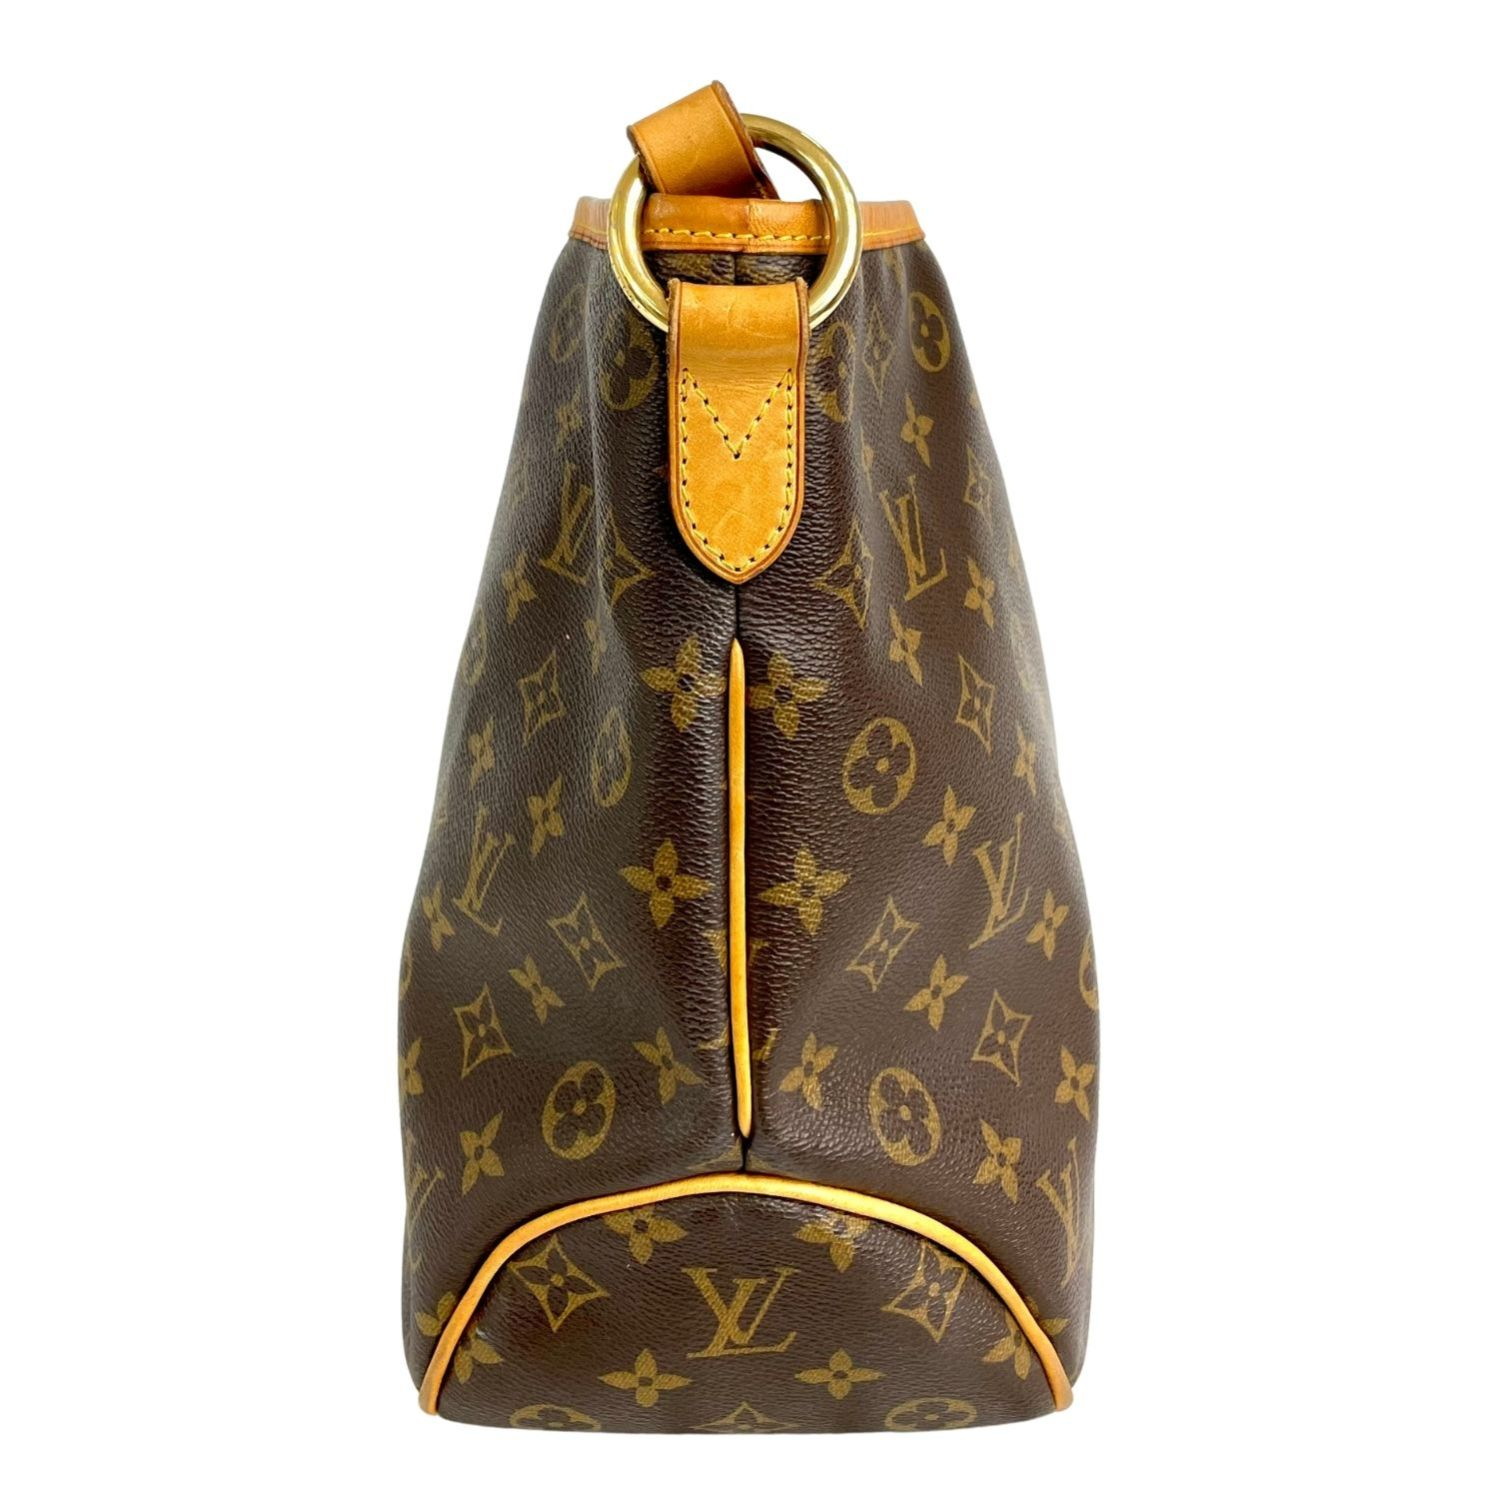 Bolsa Louis Vuitton Delightful Monograma